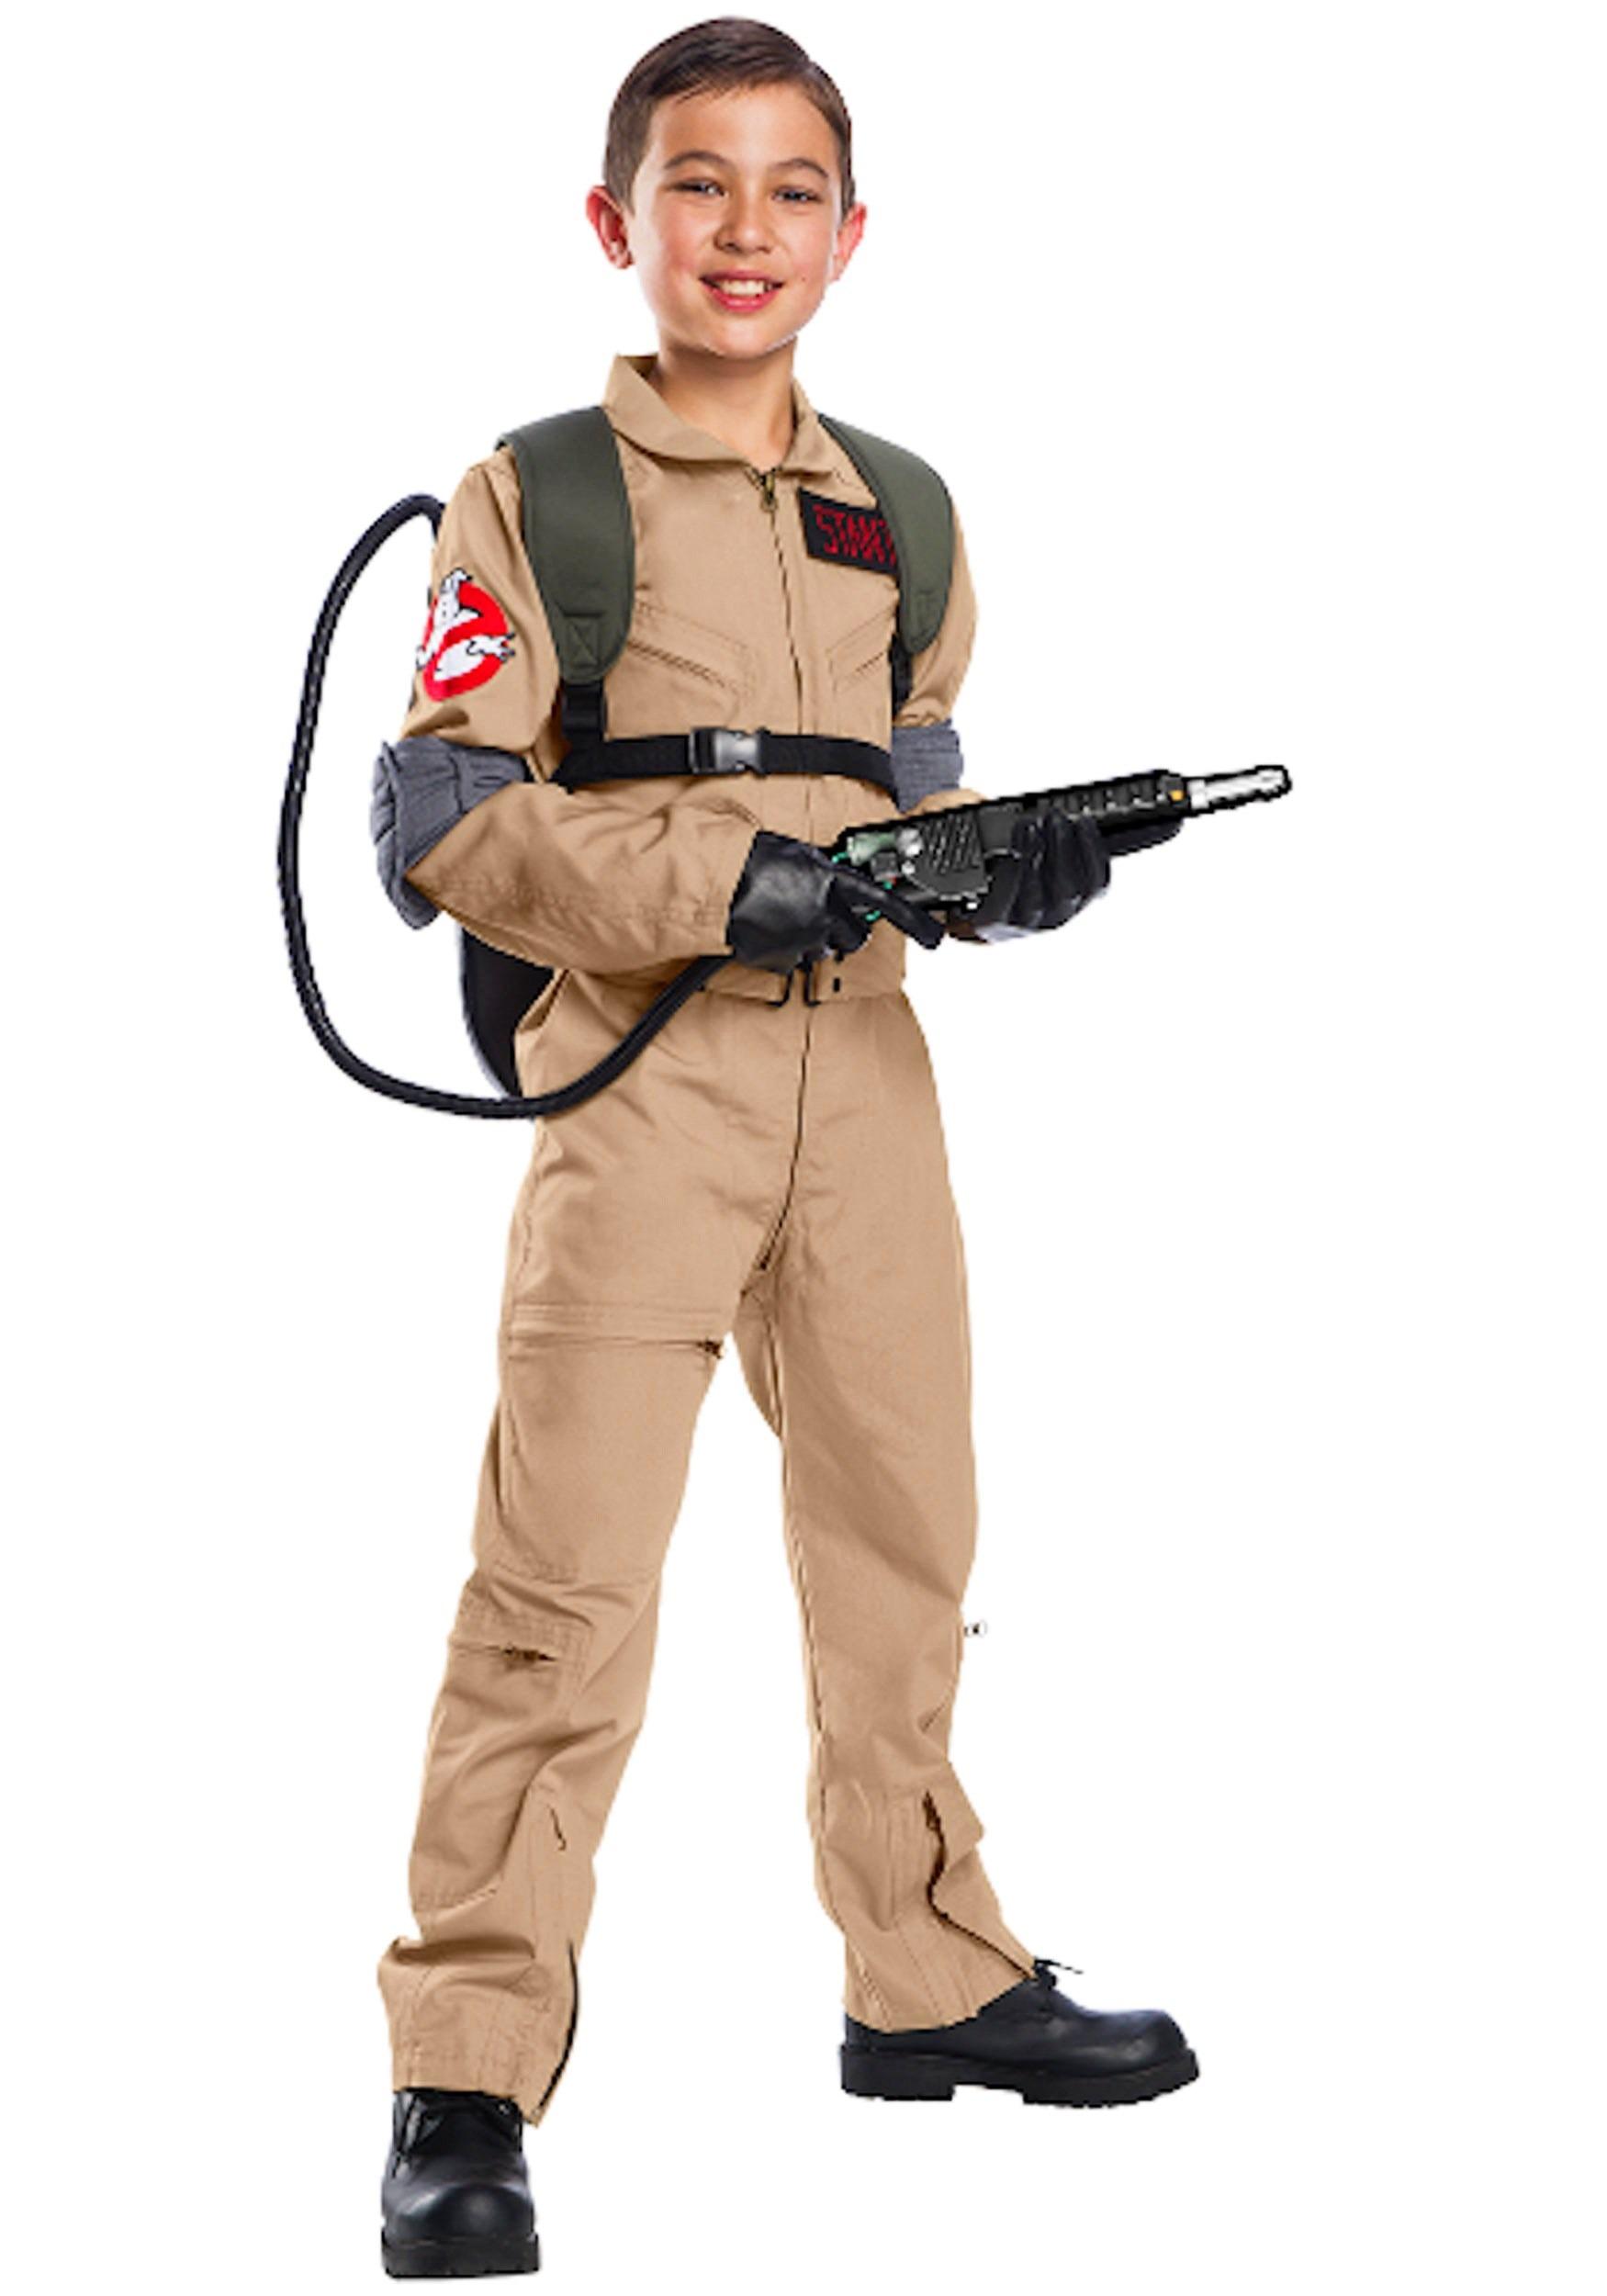 Childs Premium Ghostbusters Costume